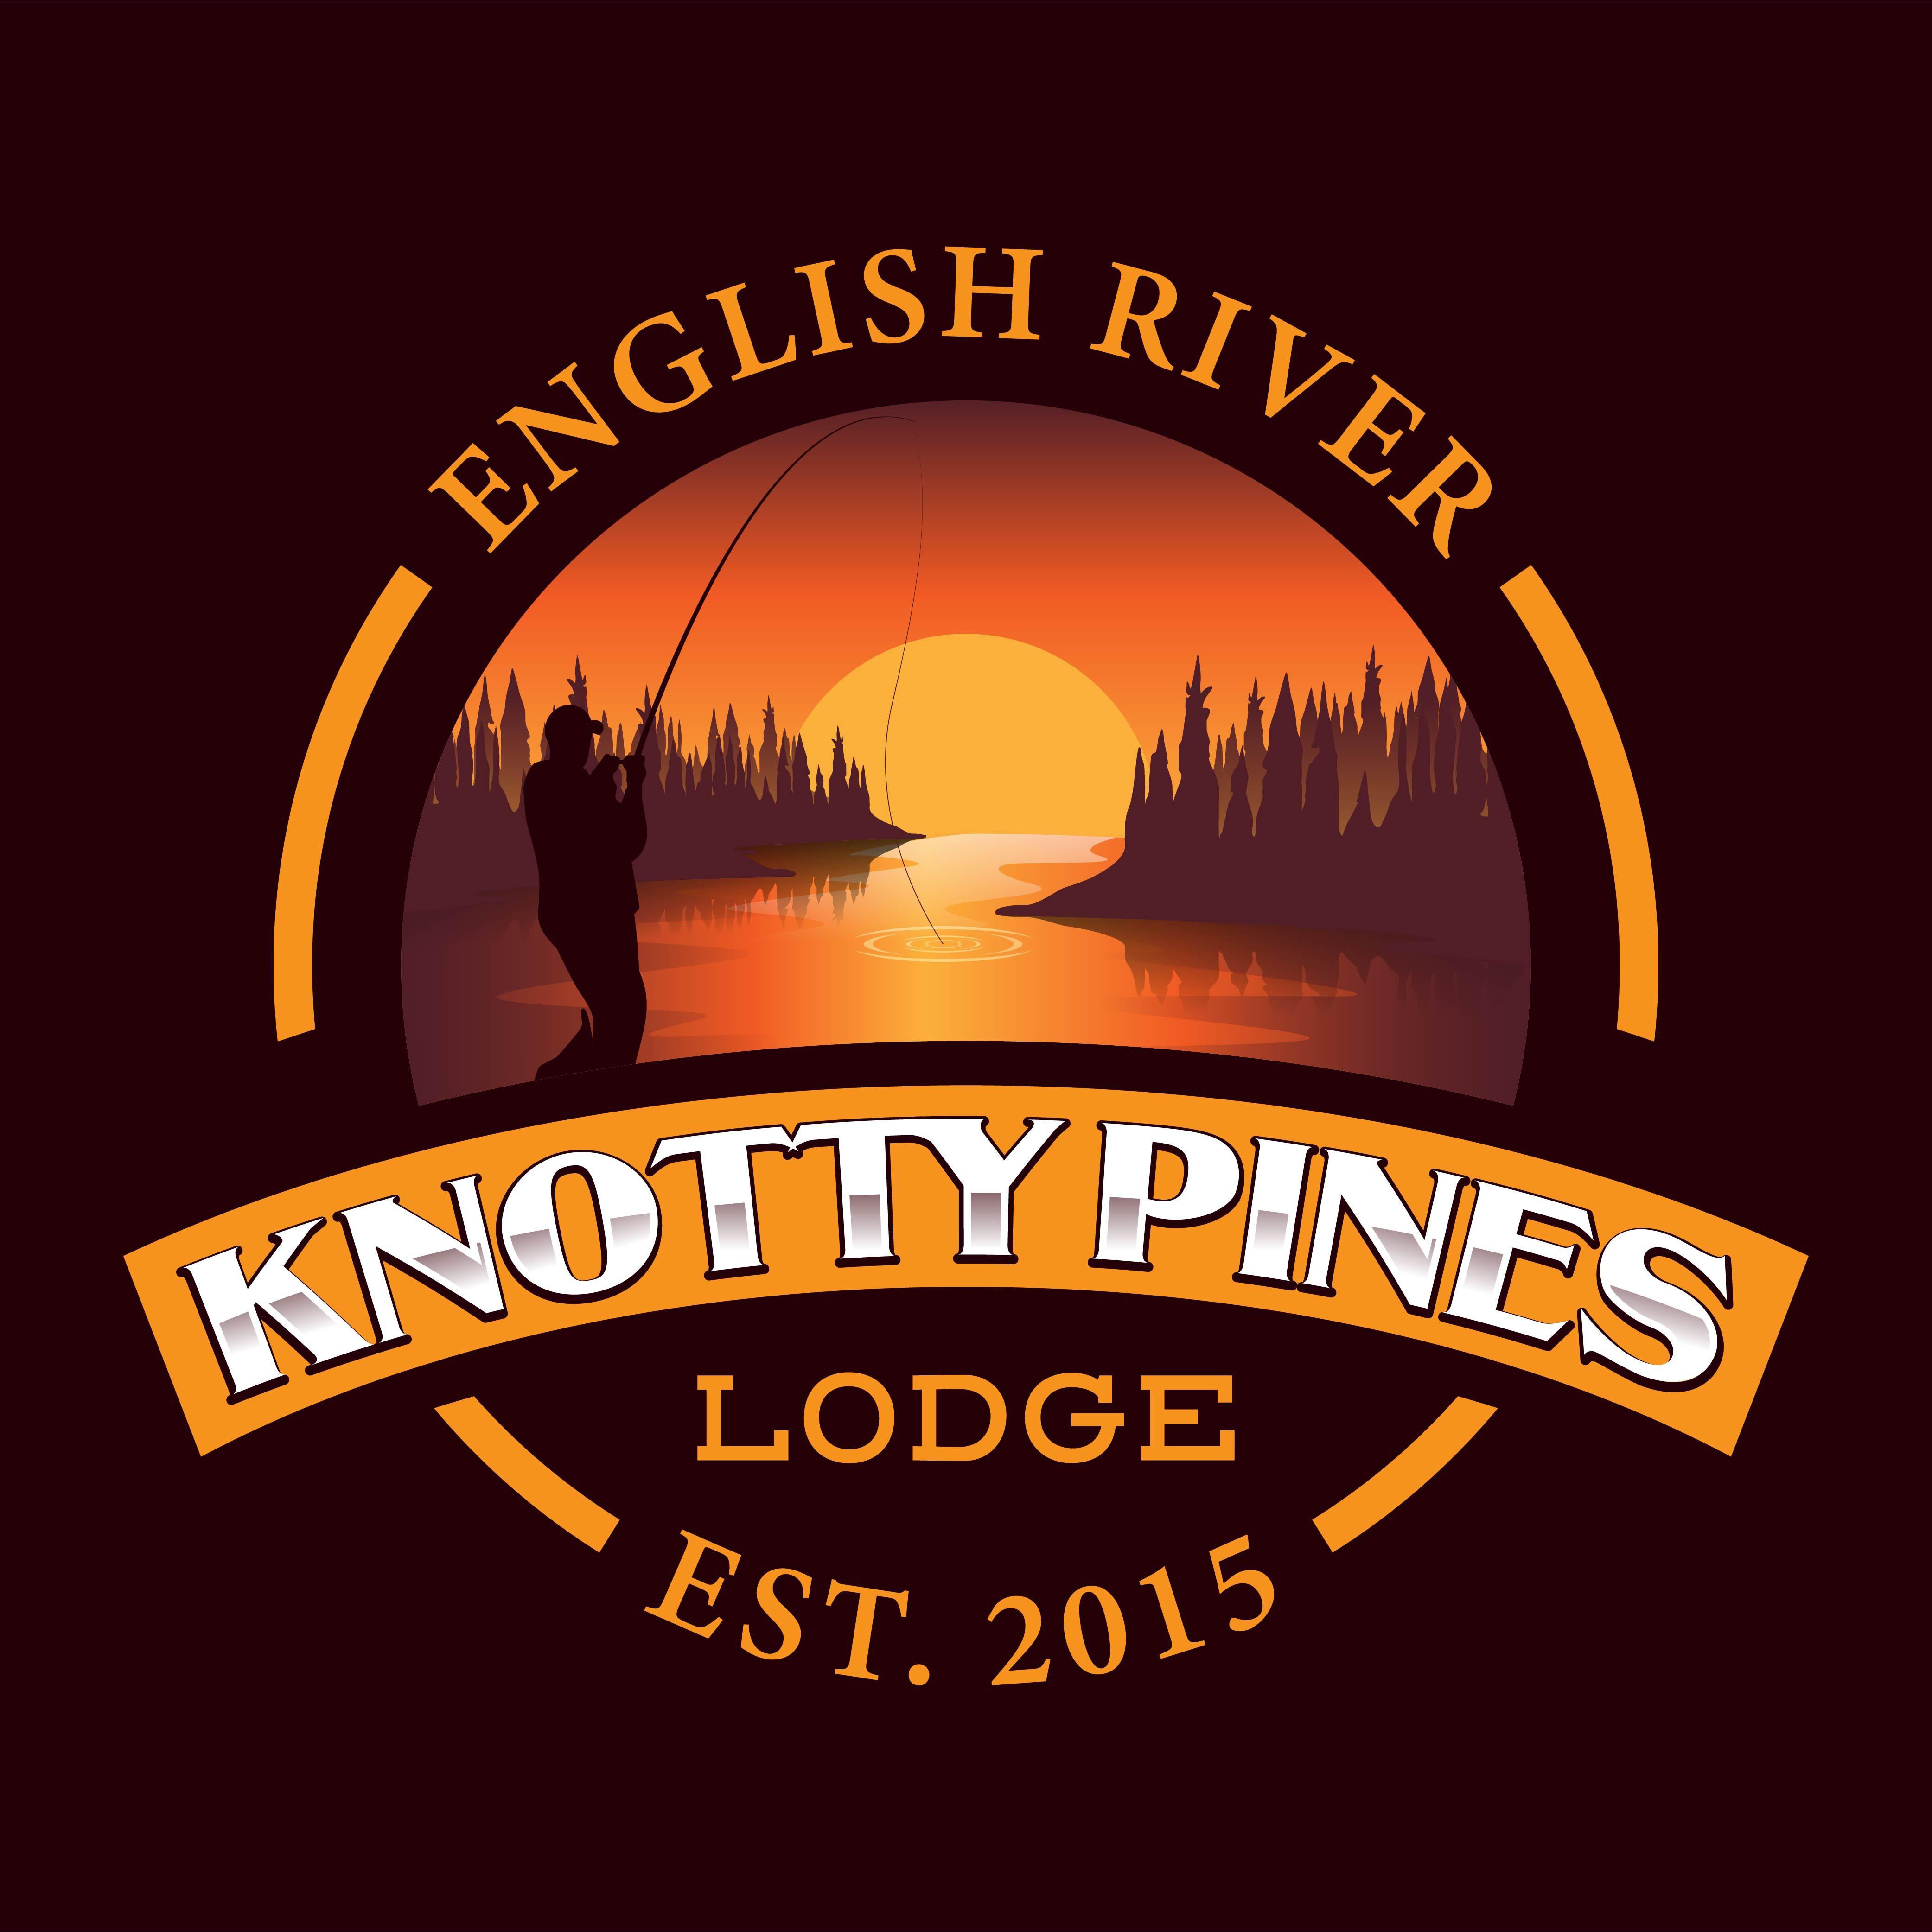 Knotty Pines Lodge